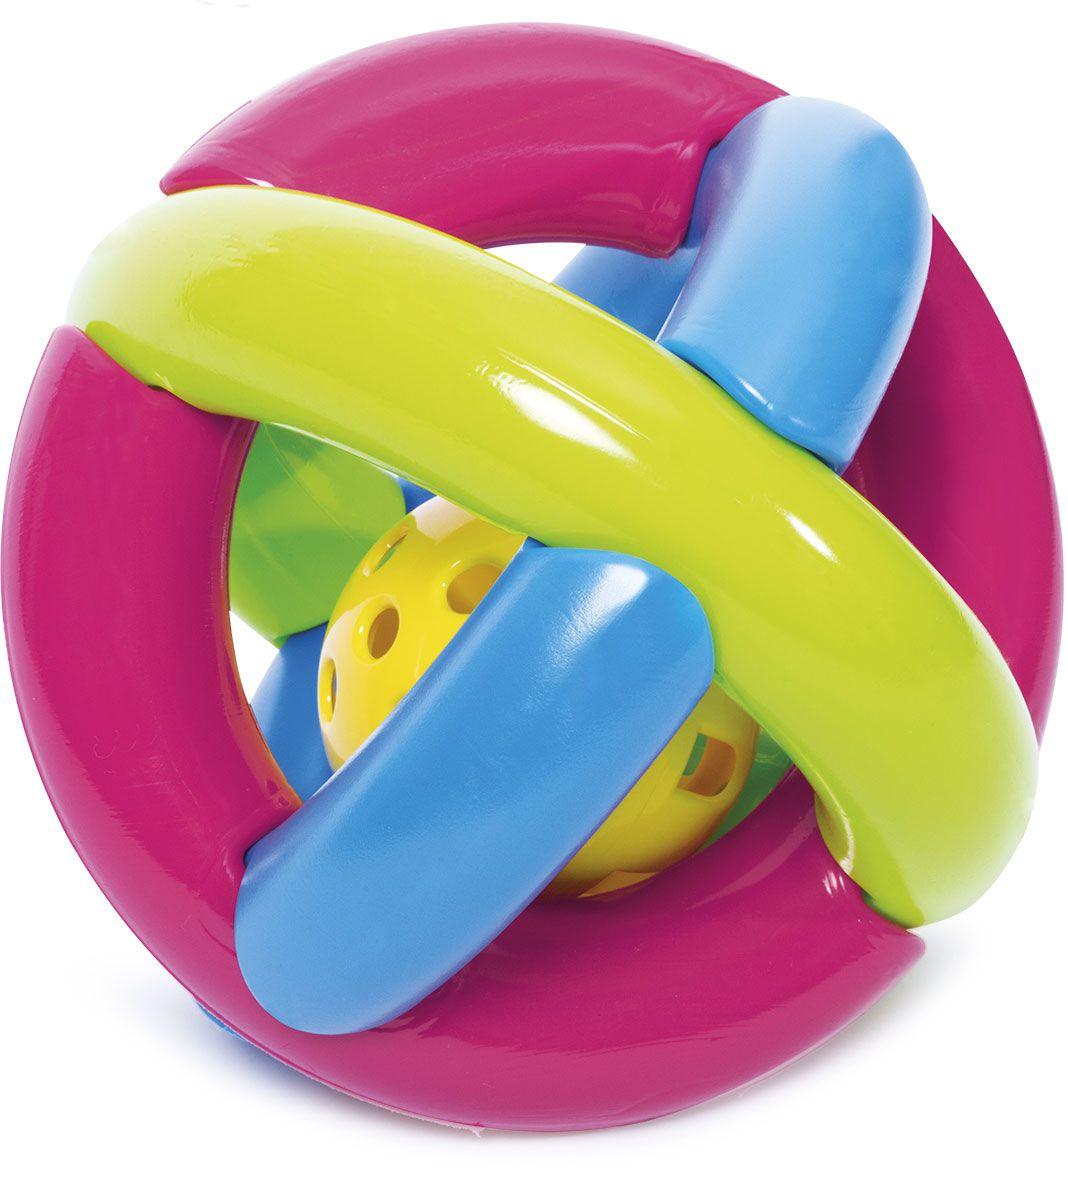 Kit Brinquedos para meu Bebê